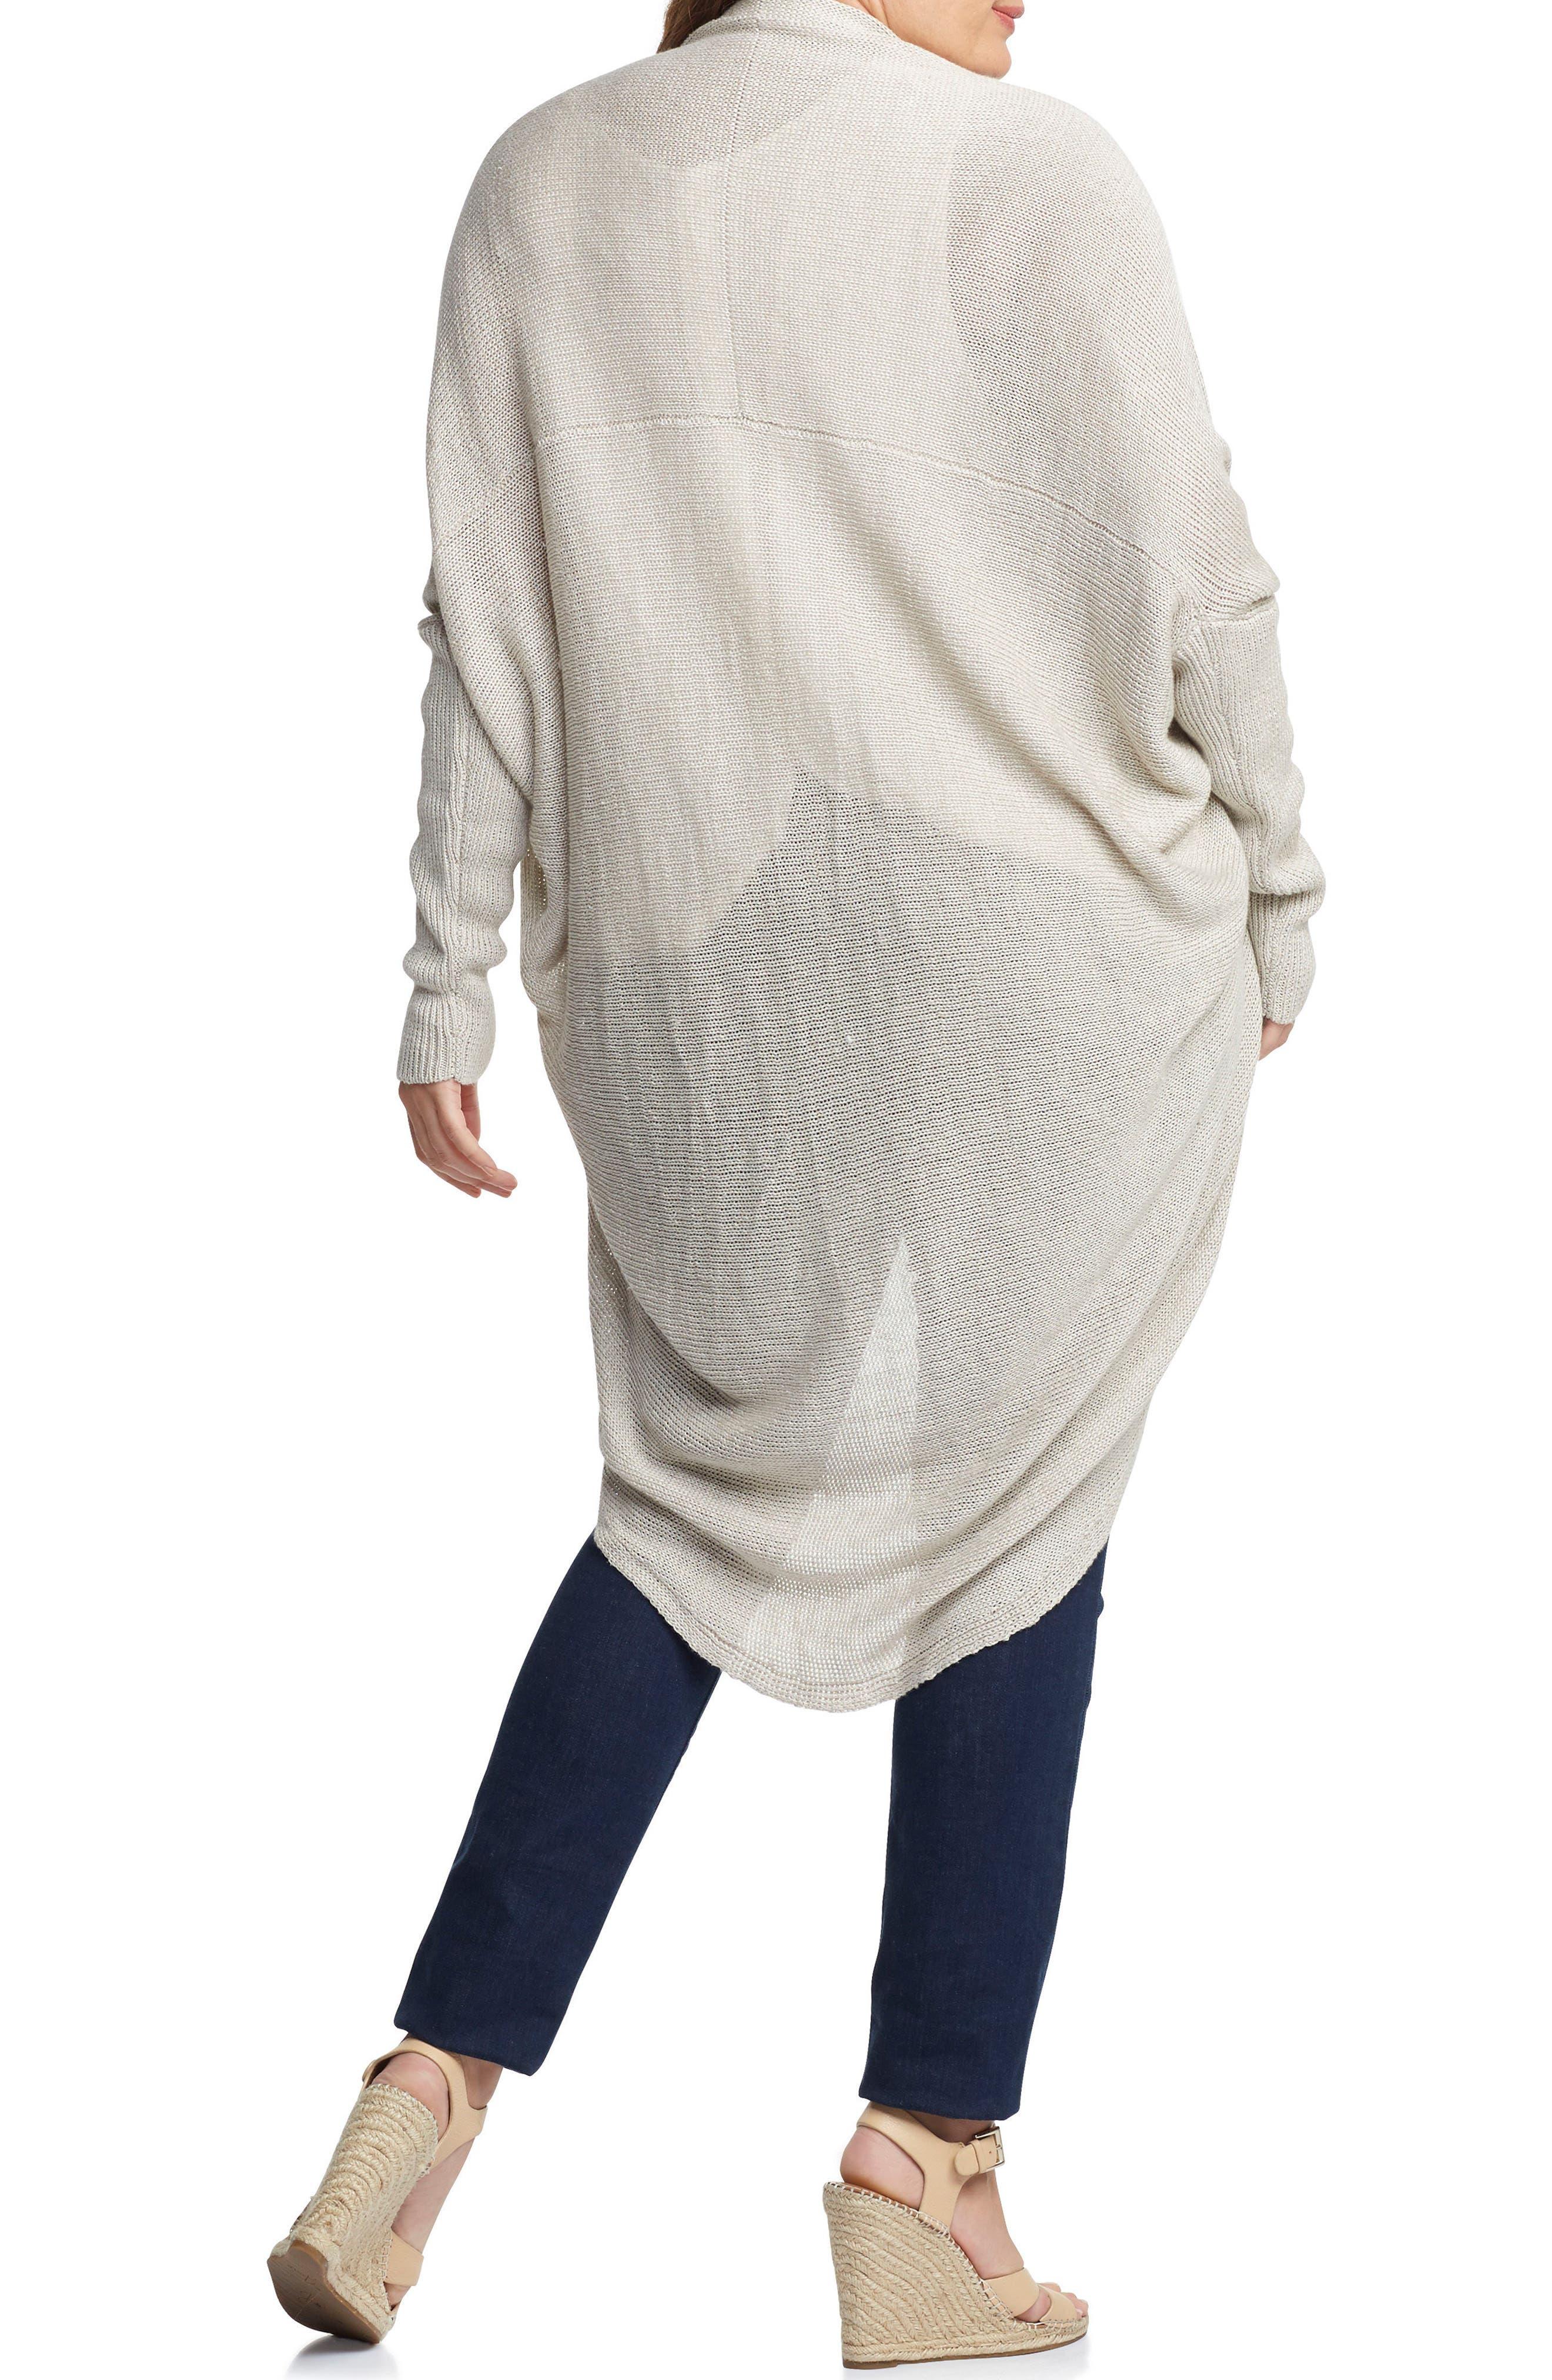 Darla Linen Blend Open Cardigan,                             Alternate thumbnail 2, color,                             LIGHT TAN